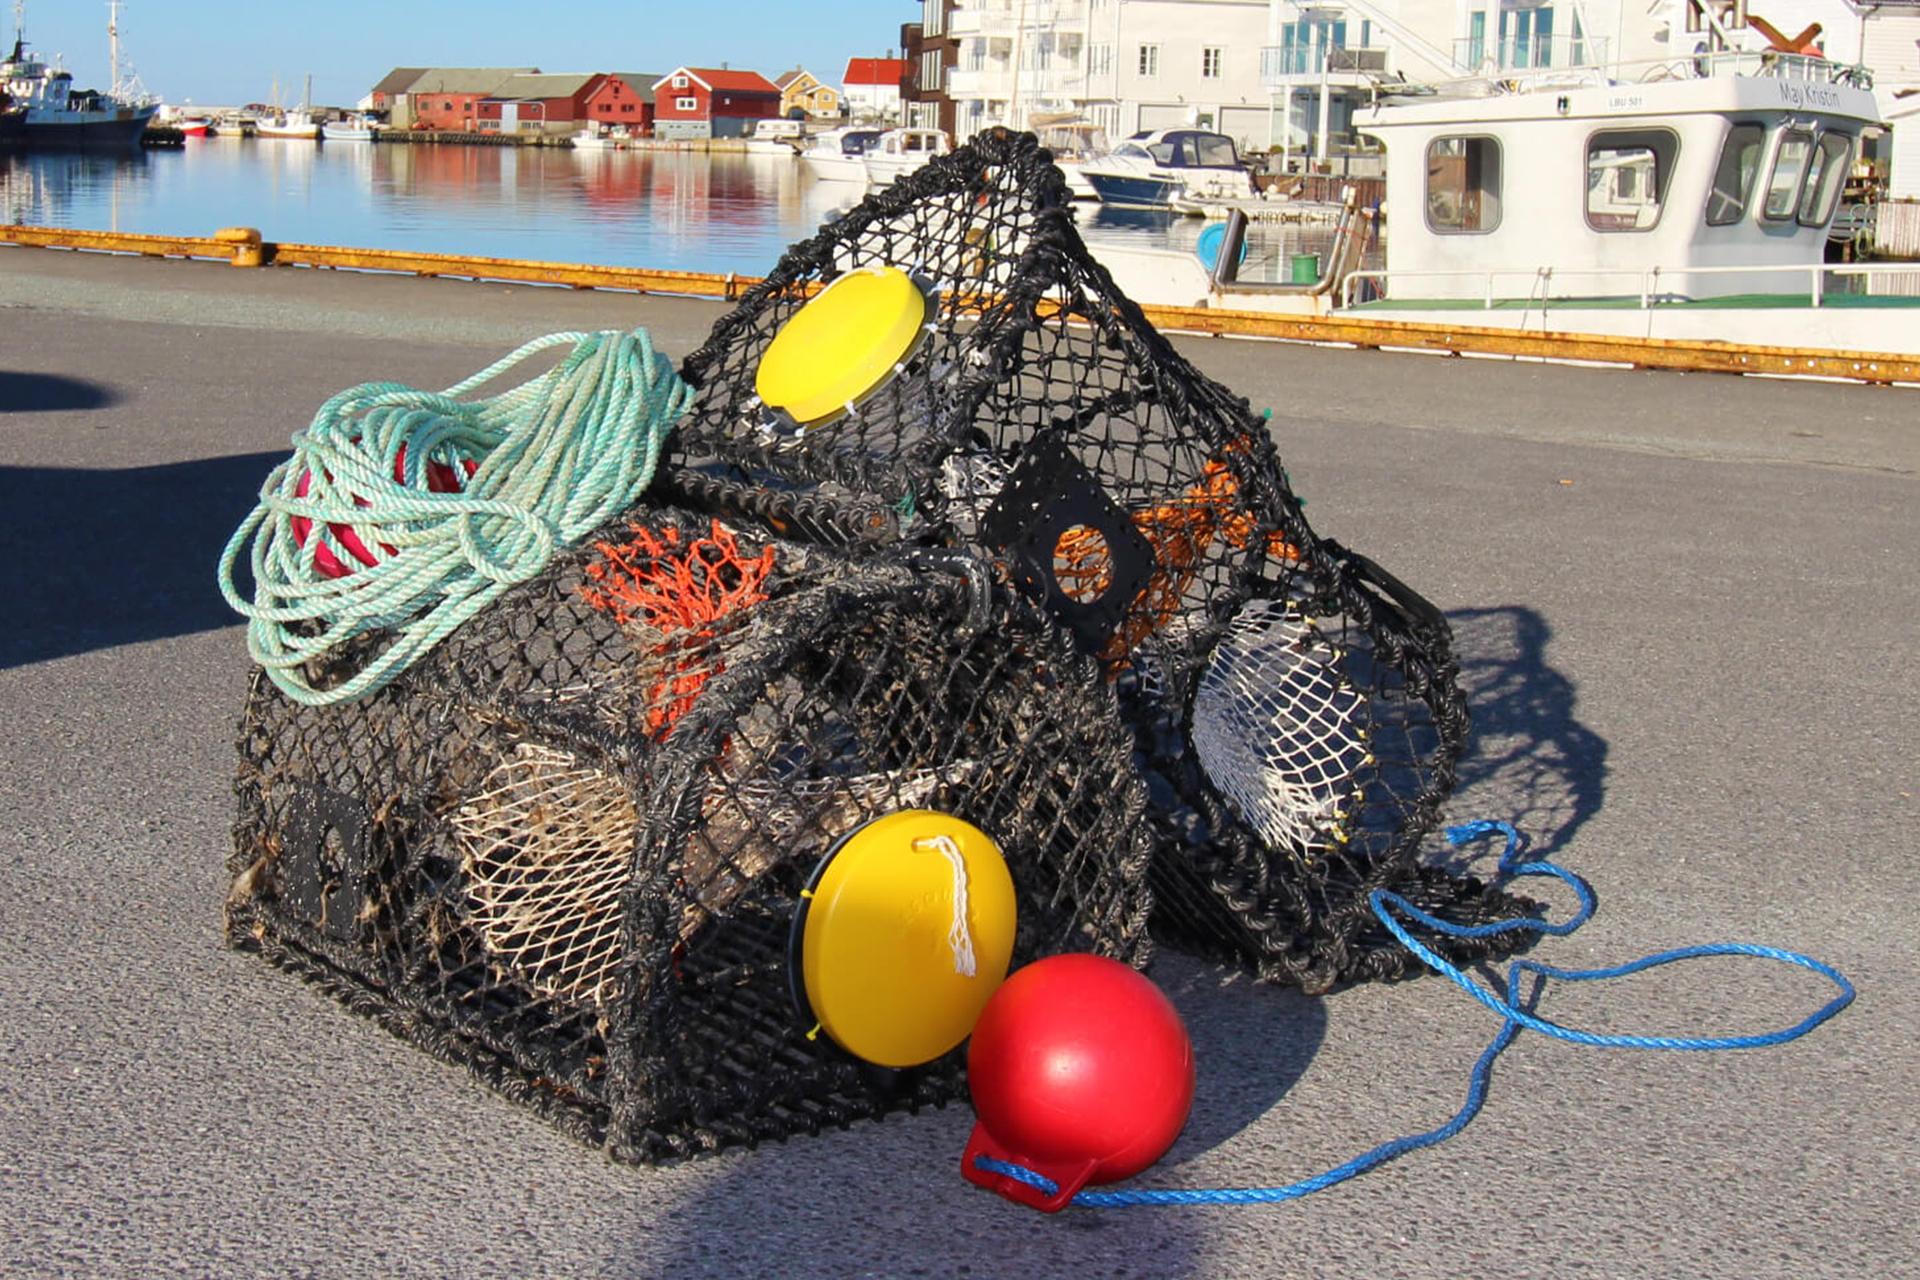 Fiskeredskap på land med flottør